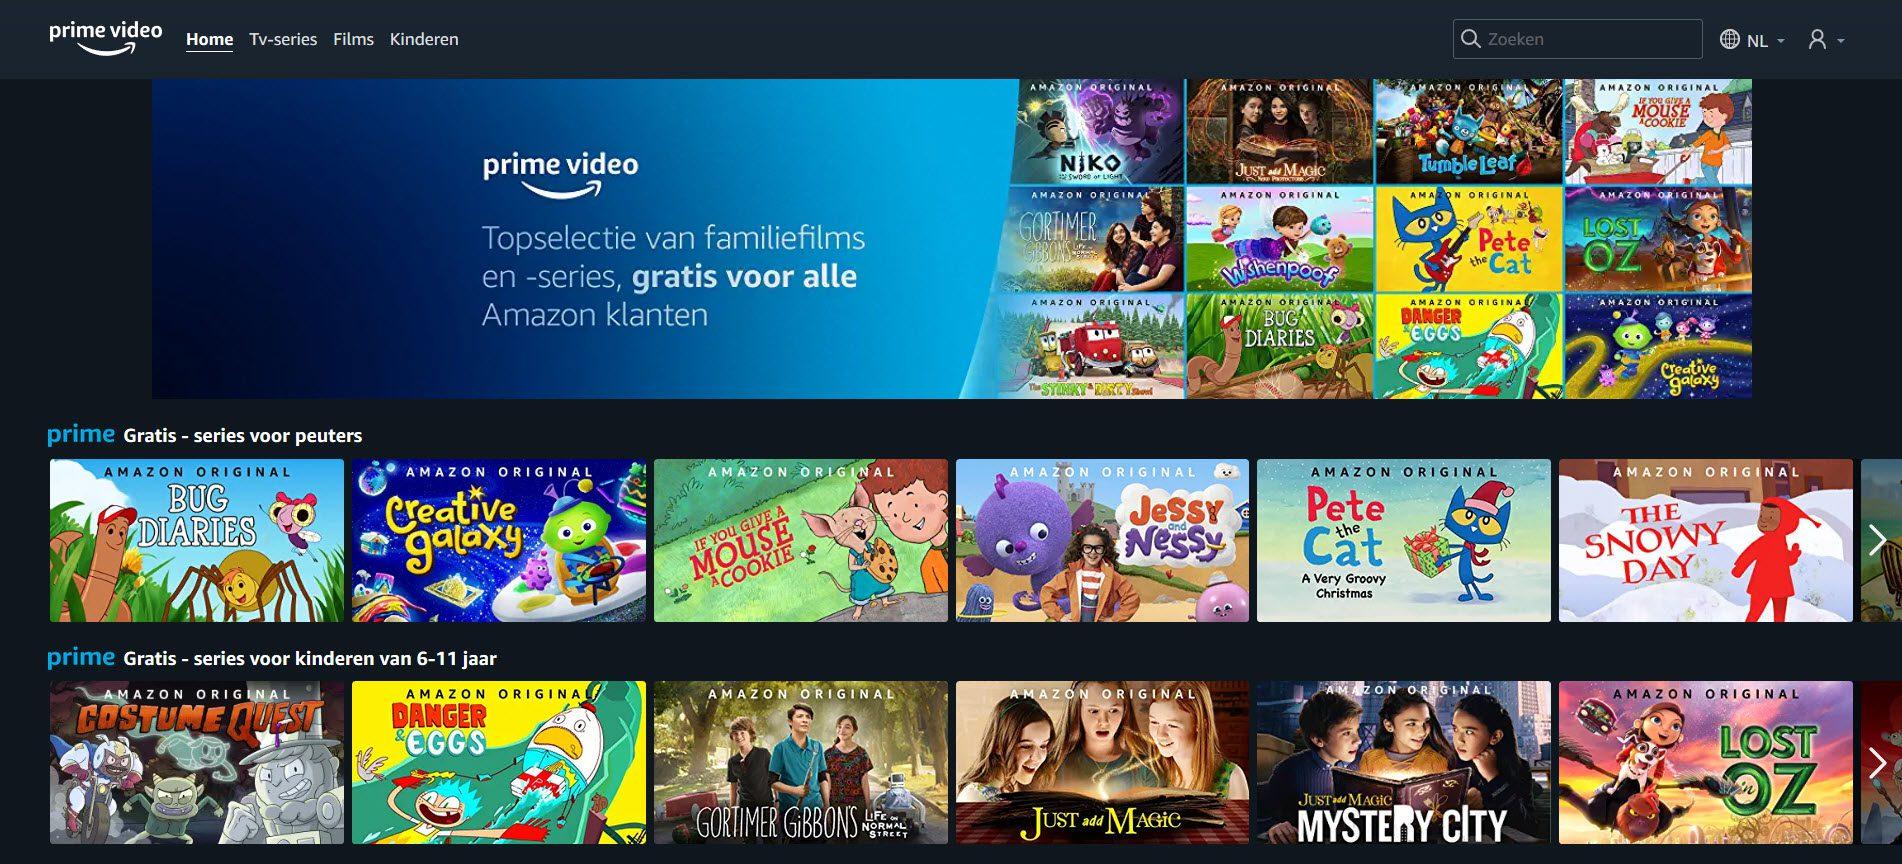 gratis streamen Amazon Prime Video - kinderfilms - kinderseries